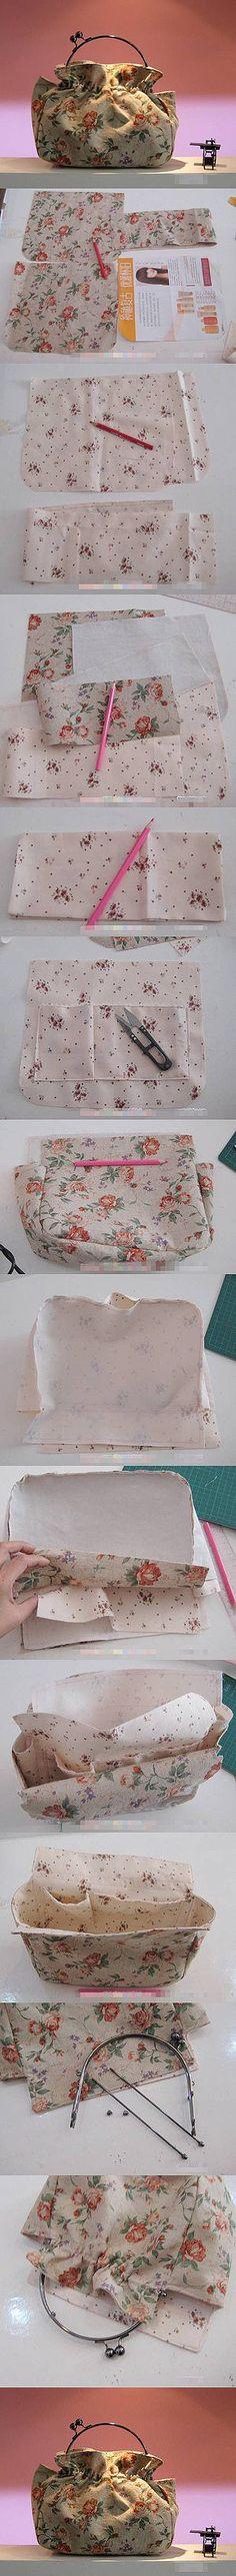 New diy bag design tuto sac 28 Ideas Sewing Hacks, Sewing Tutorials, Sewing Patterns, Tutorial Sewing, Fabric Crafts, Sewing Crafts, Sewing Projects, Diy Projects, Handmade Handbags